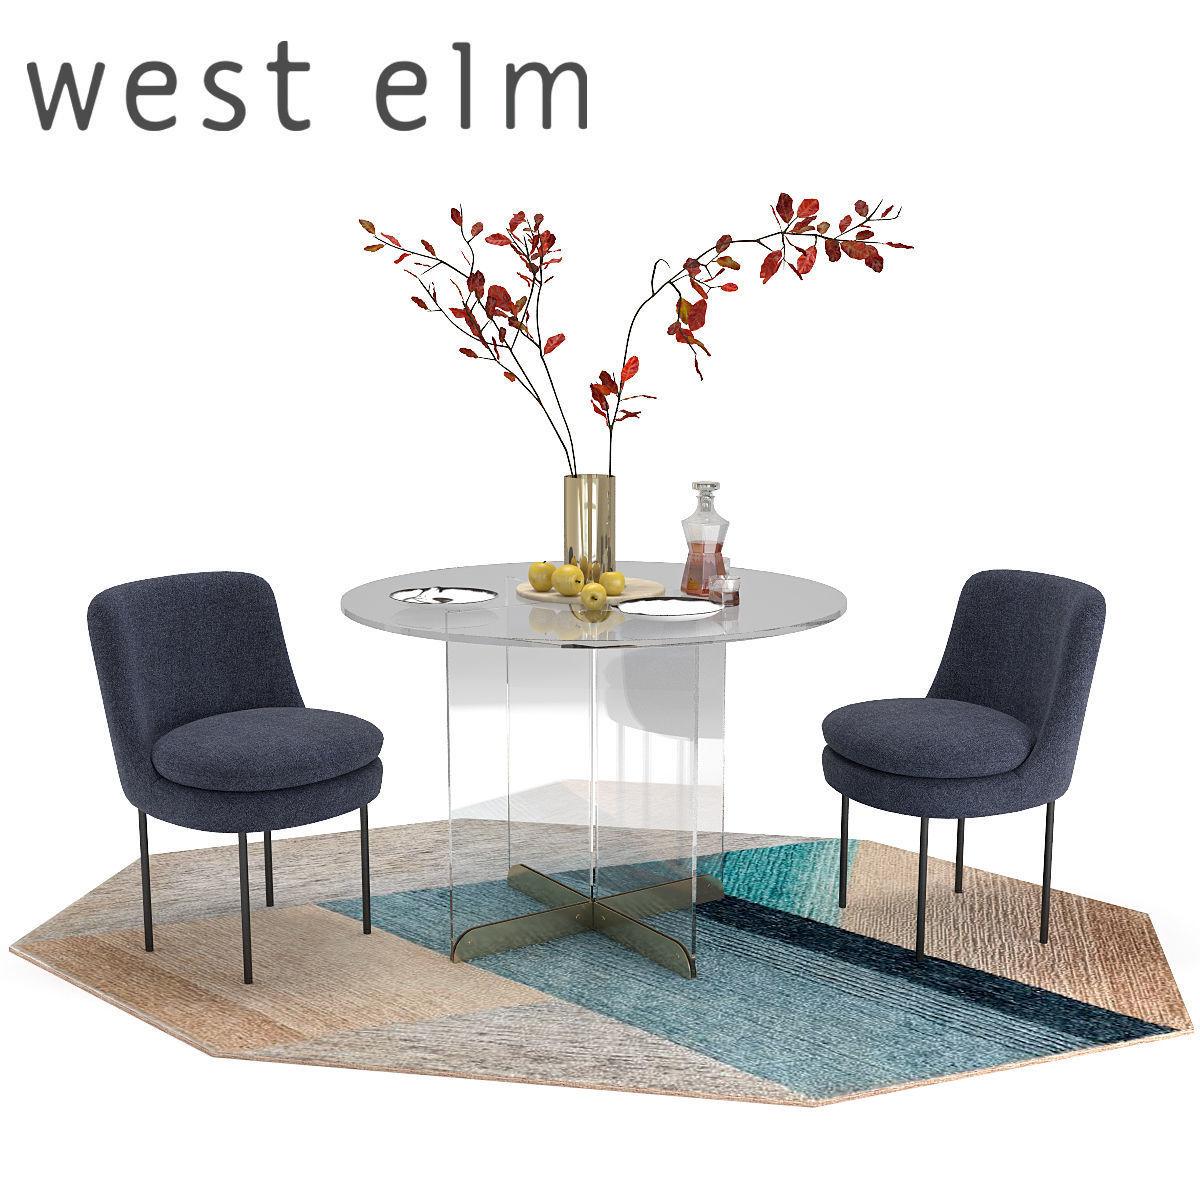 Astounding West Elm Calliope Table Modern Curved Chair 3D Model Inzonedesignstudio Interior Chair Design Inzonedesignstudiocom